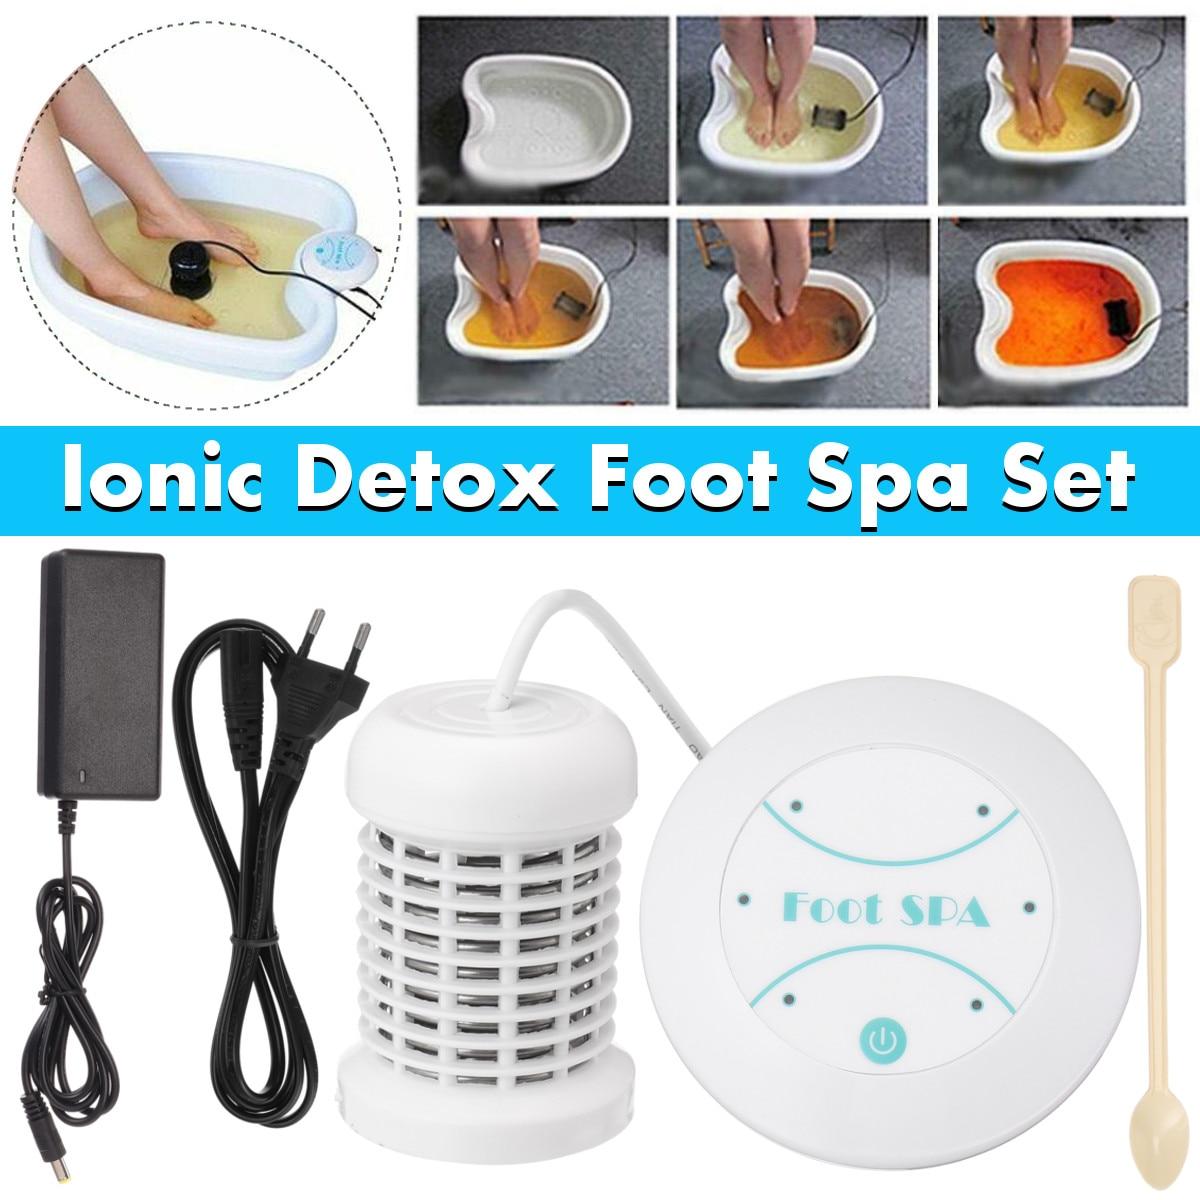 Mini máquina de desintoxicación de pies Ion limpieza iónica desintoxicación de pies baño Aqua Cell Spa máquina de masaje de pies baño desintoxicación matrices de baño Aqua Spa